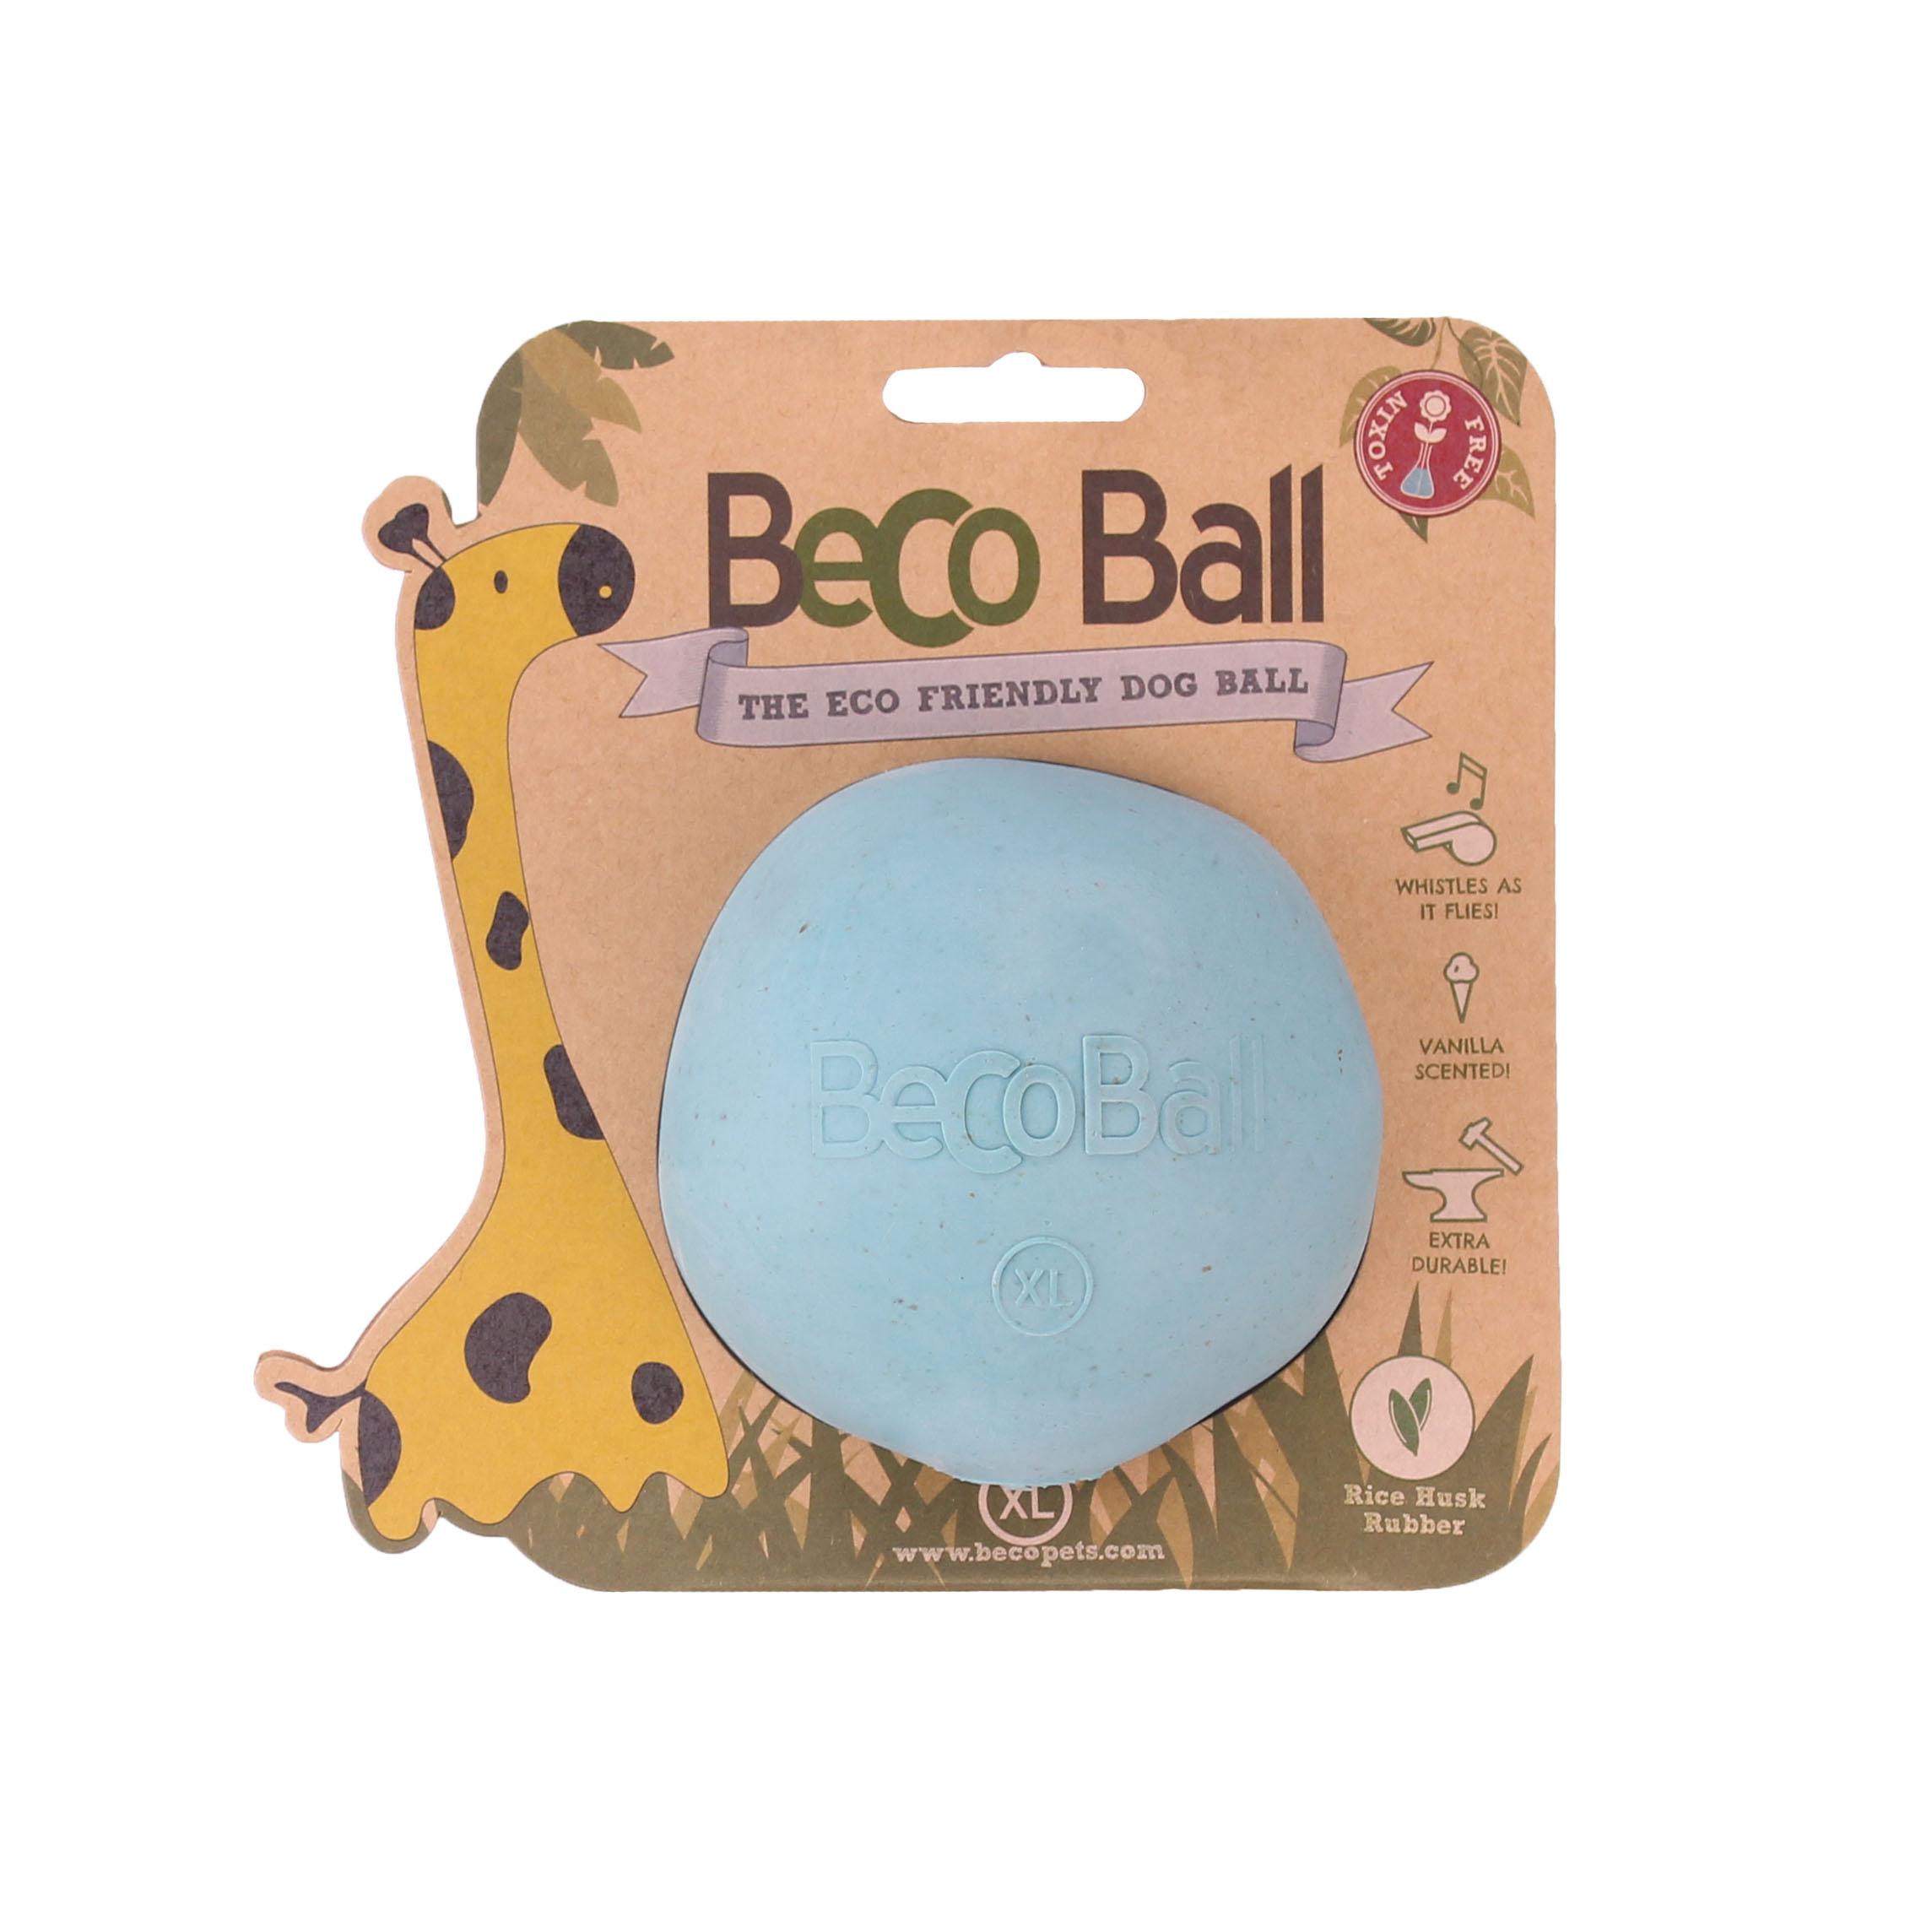 Beco Ball Dog Toy, Blue, X-Large